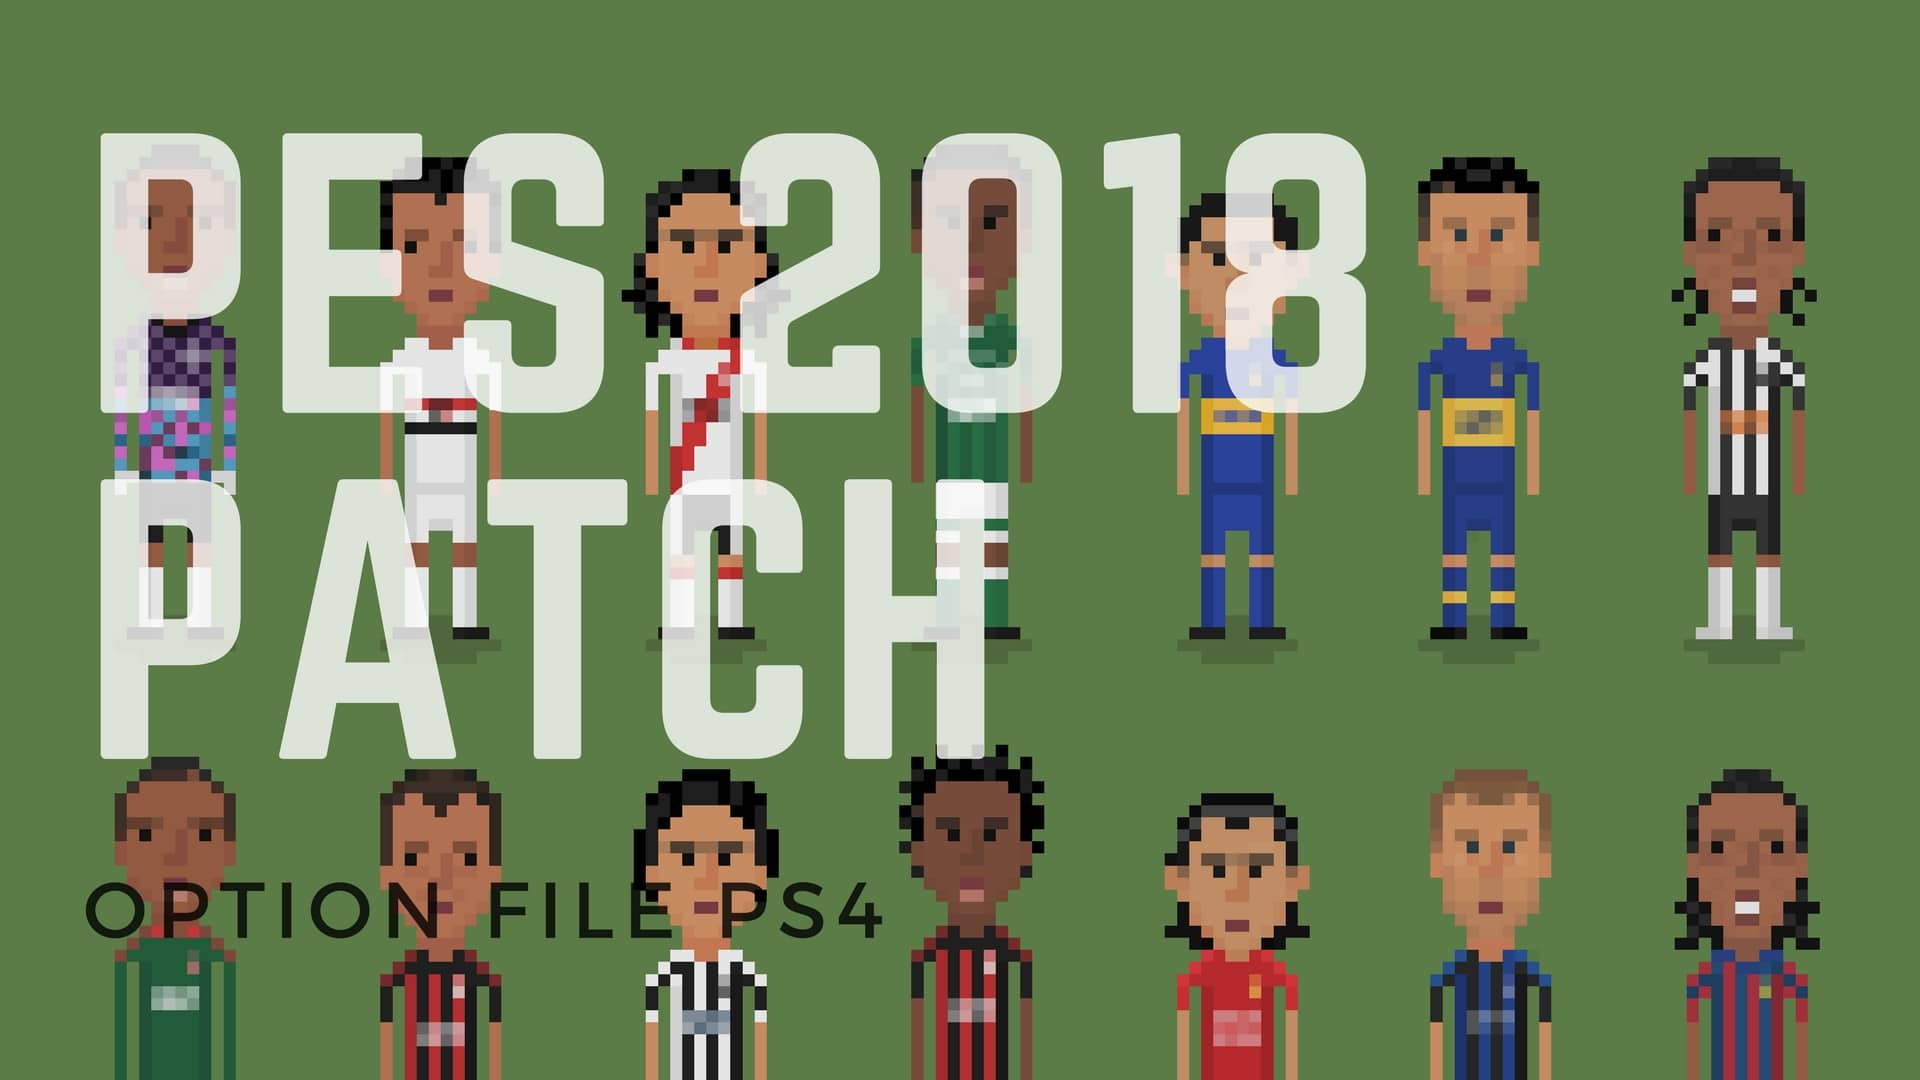 Pes 2018 Patch Ps4 Dlc 30 Lizenzen Bundesliga Anleitung Sony Pro Evolution Soccer Premium Edition